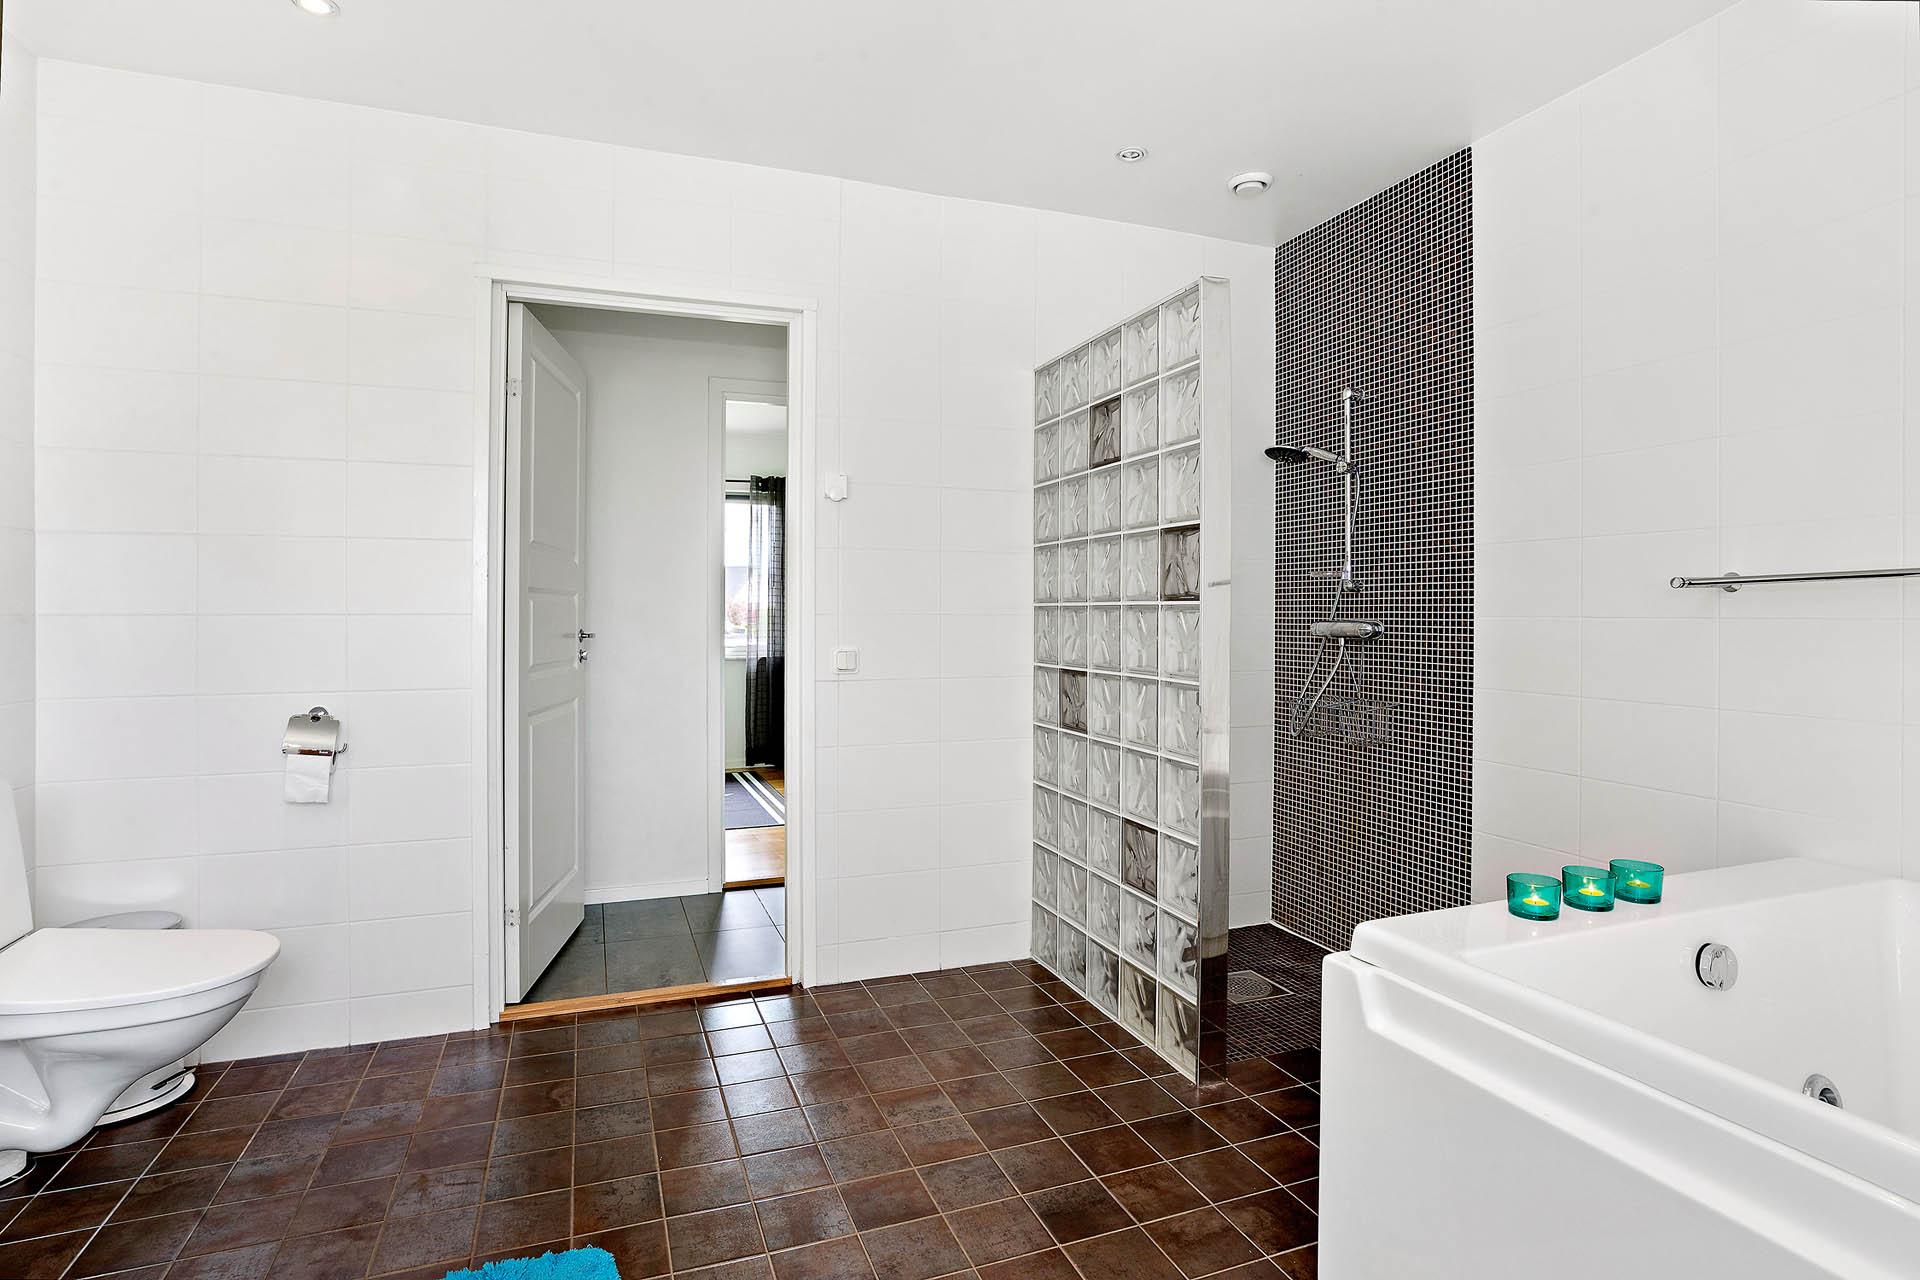 Badrum med bubbelbadkar och dusch